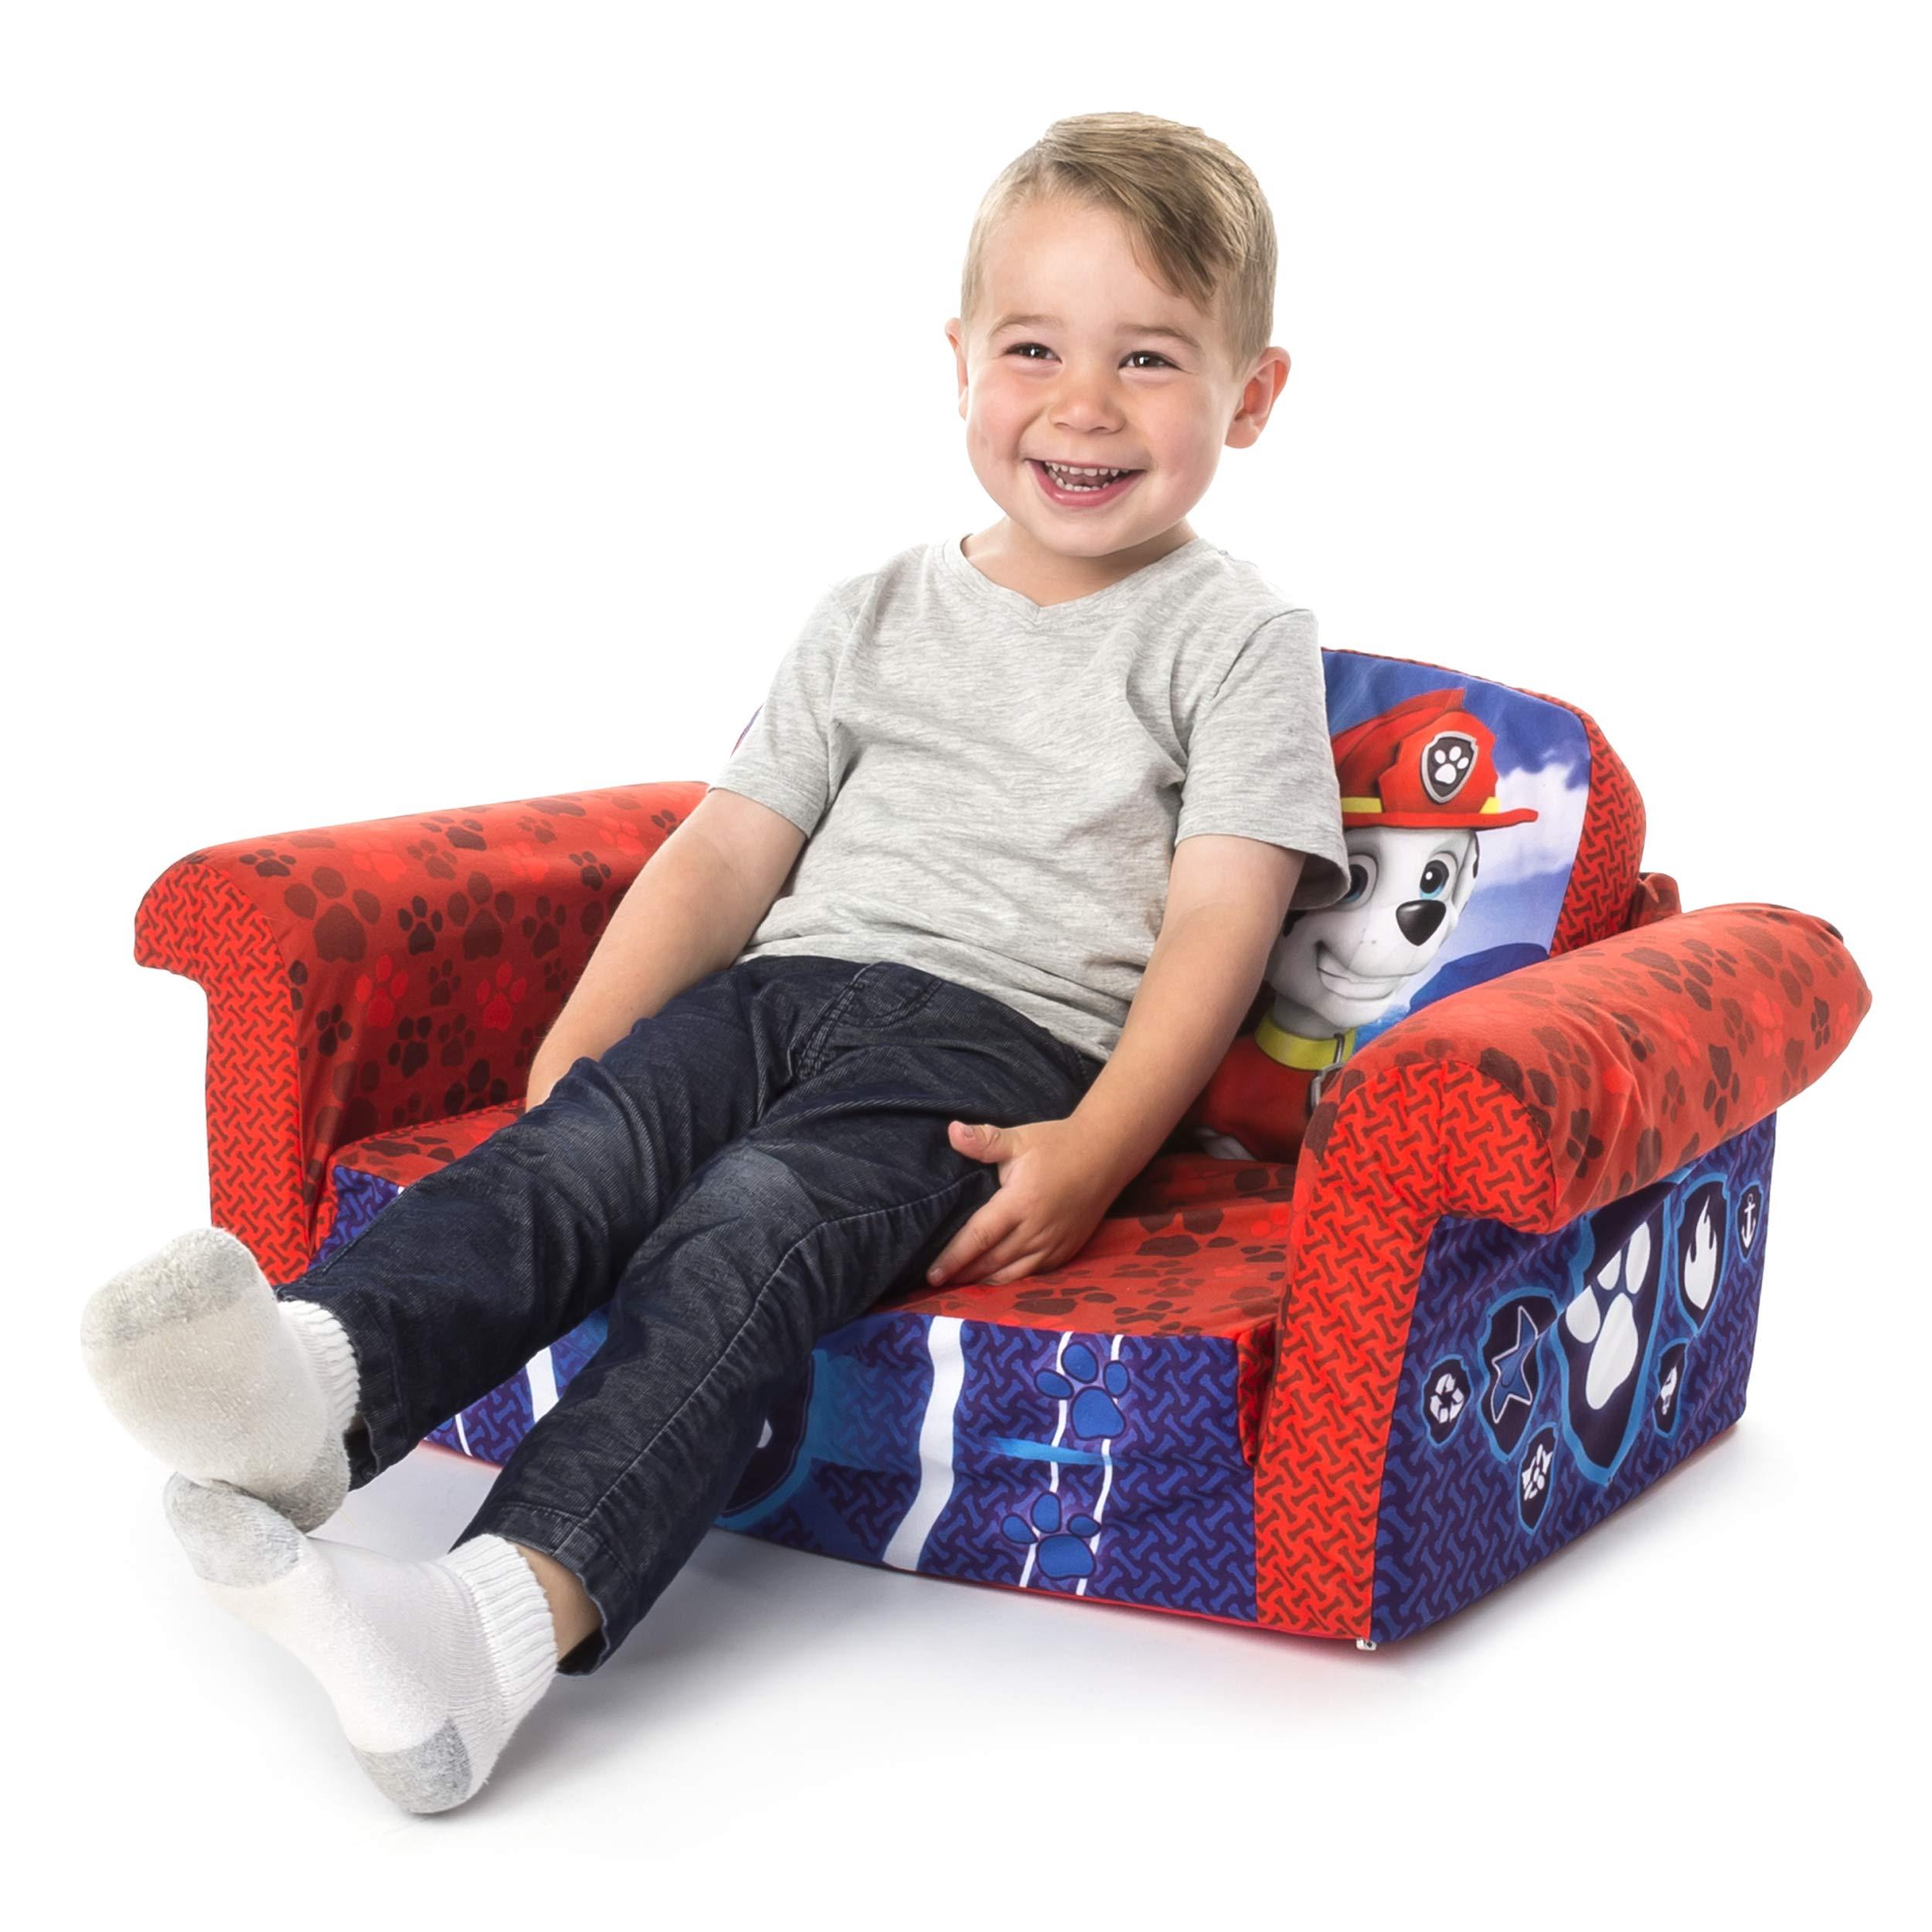 Marshmallow Furniture, Children's 2 in 1 Flip Open Foam Sofa, Nickelodeon Paw Patrol, by Spin Master by Marshmallow Furniture